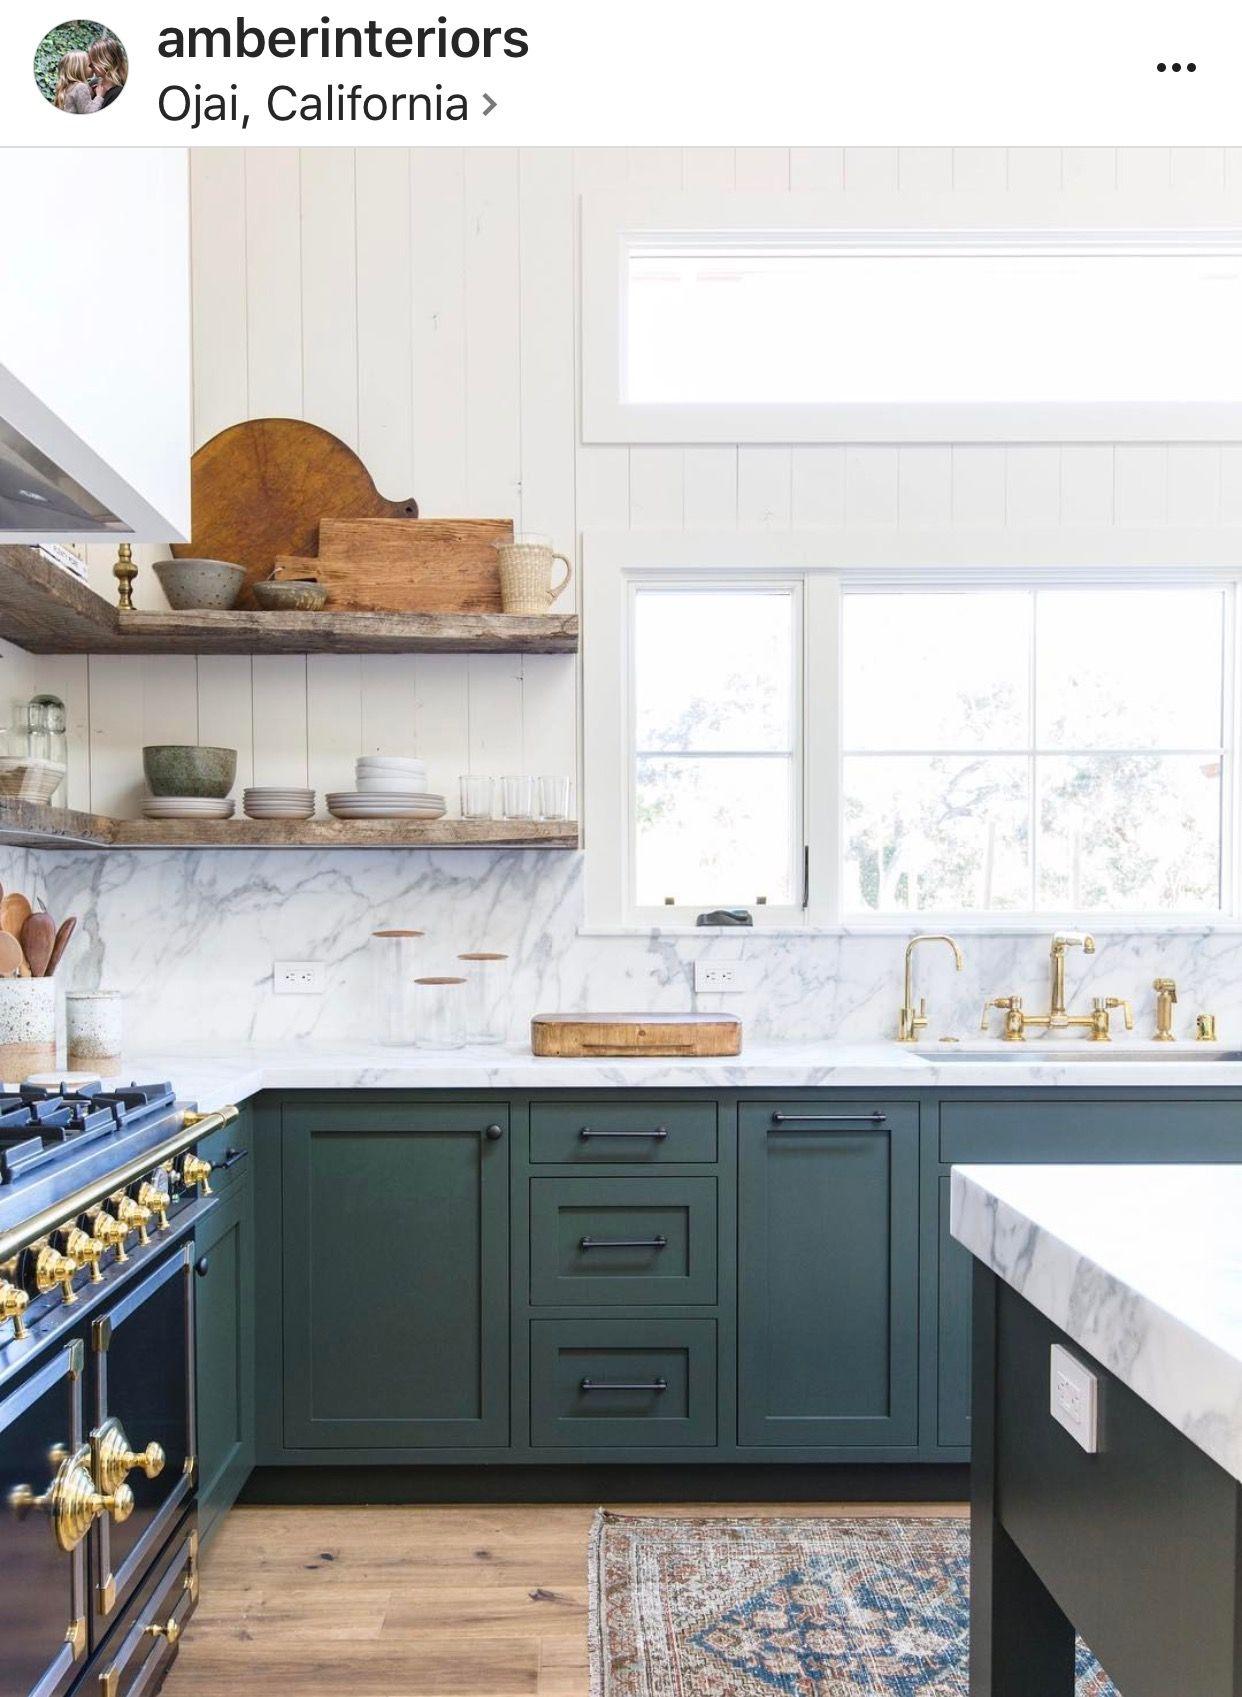 26be732d94e8937c3e3bb564596a61fc Painting Kitchen Cabinets Color Ideas Pinterest on pinterest kitchen paint color ideas, pinterest small bathroom color ideas, contrasting kitchen island ideas,